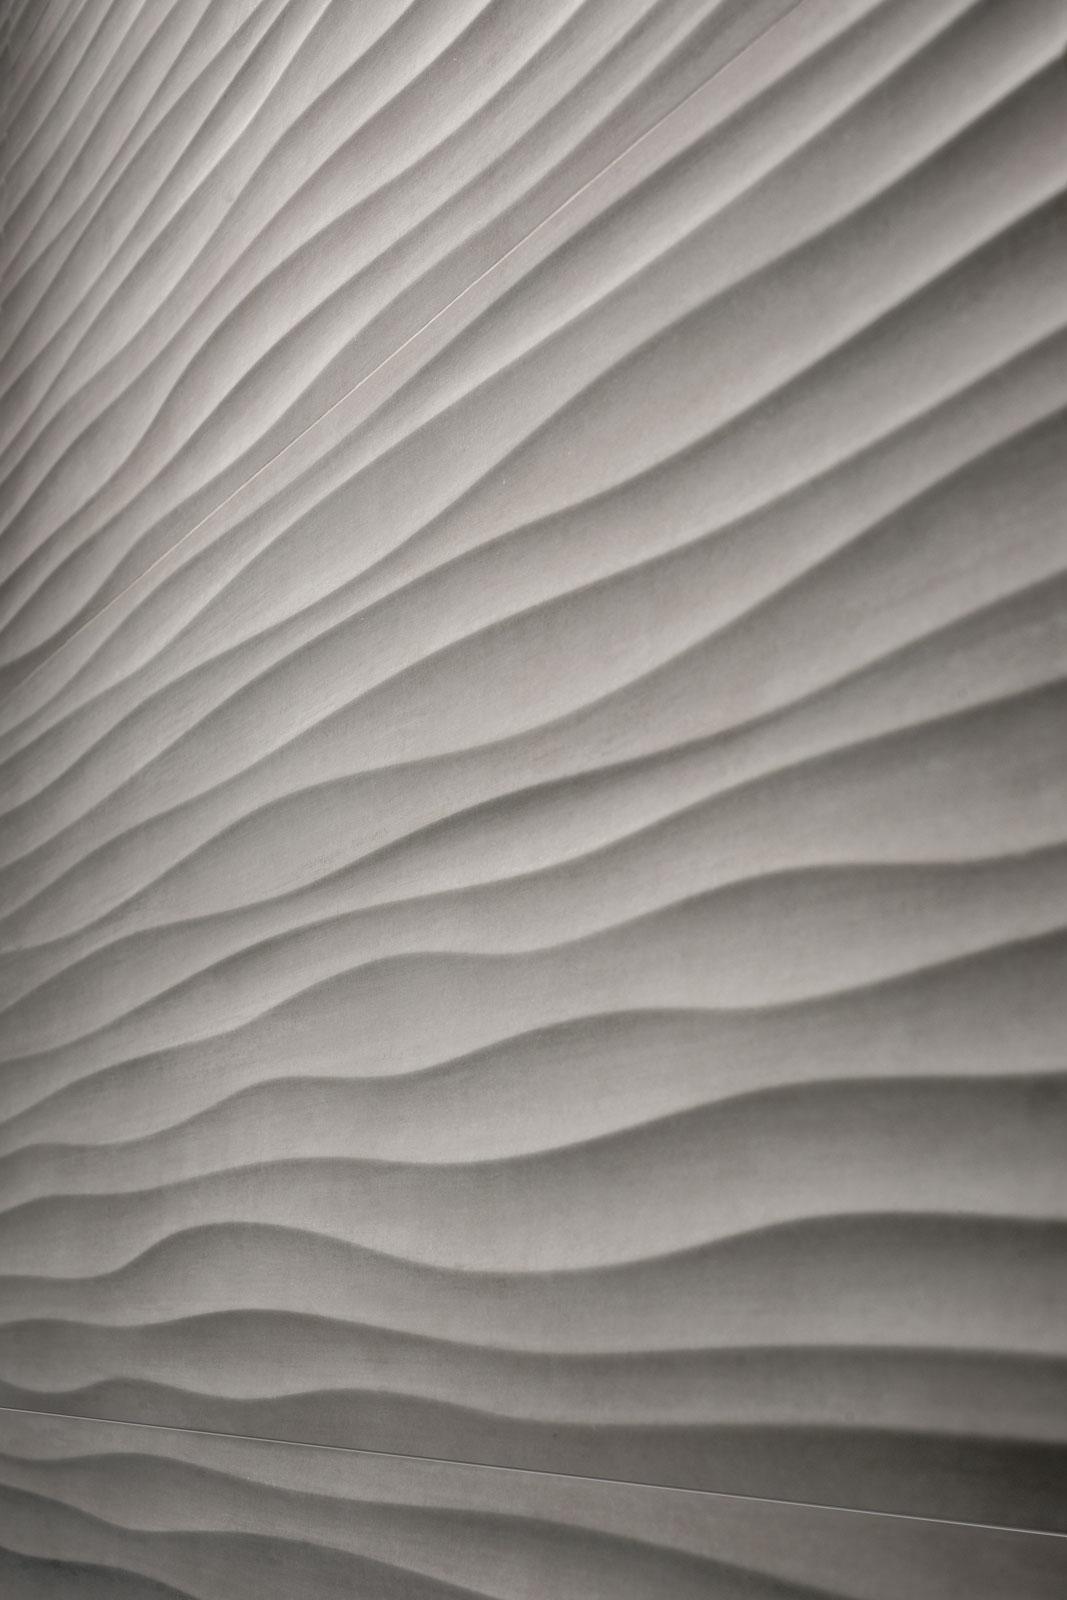 Materika Satin Concrete Effect Wall Tiles Marazzi